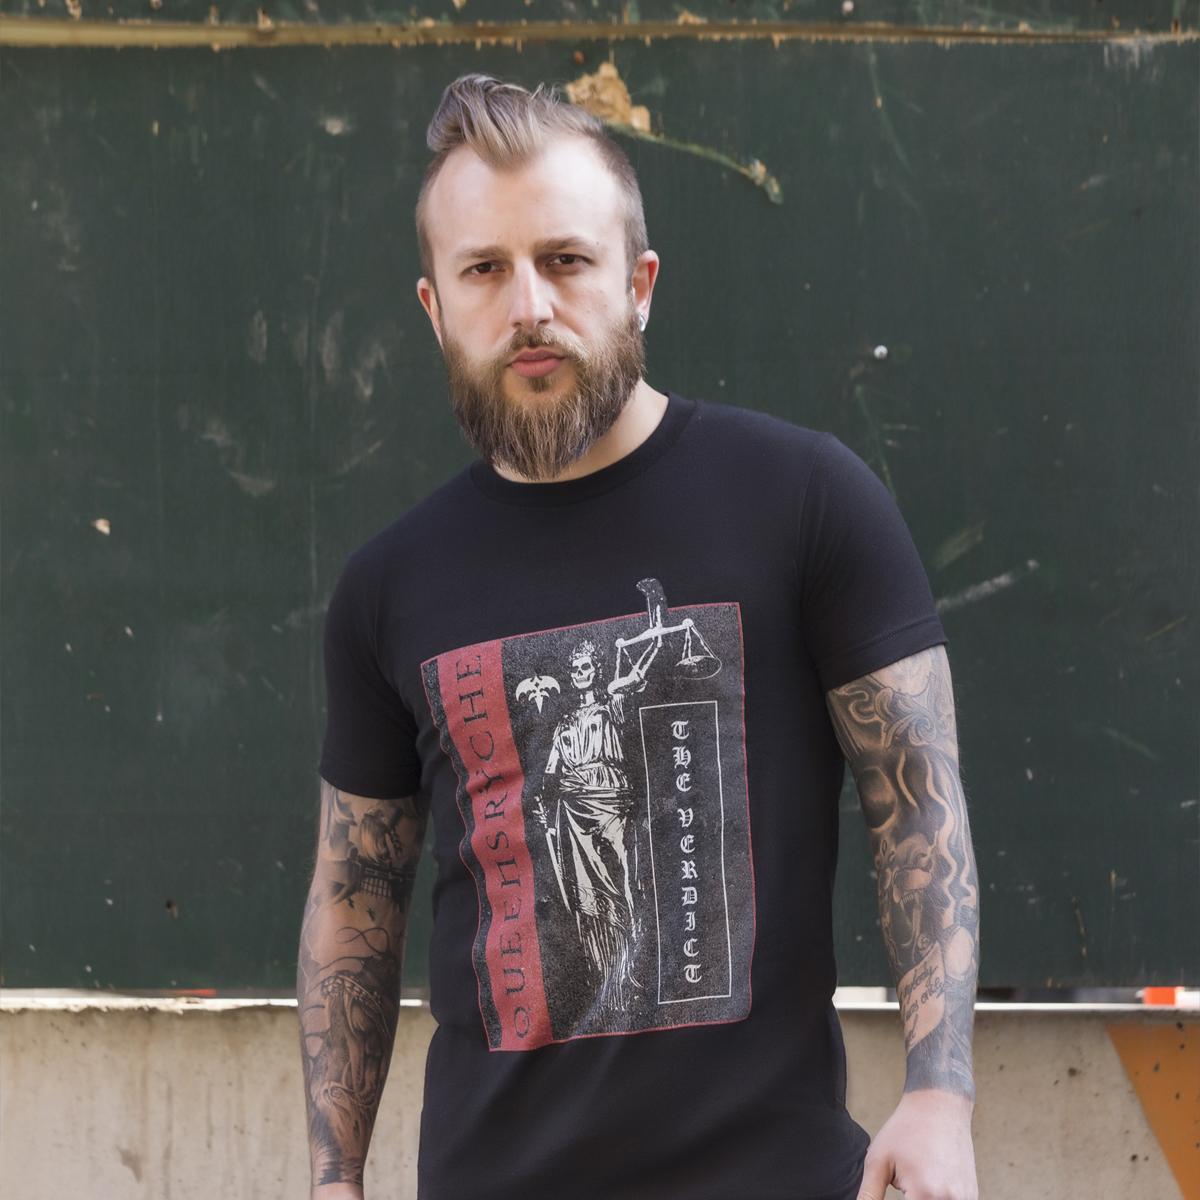 Queensrÿche - The Verdict Limited Edition Digipak + Justice Black T-Shirt